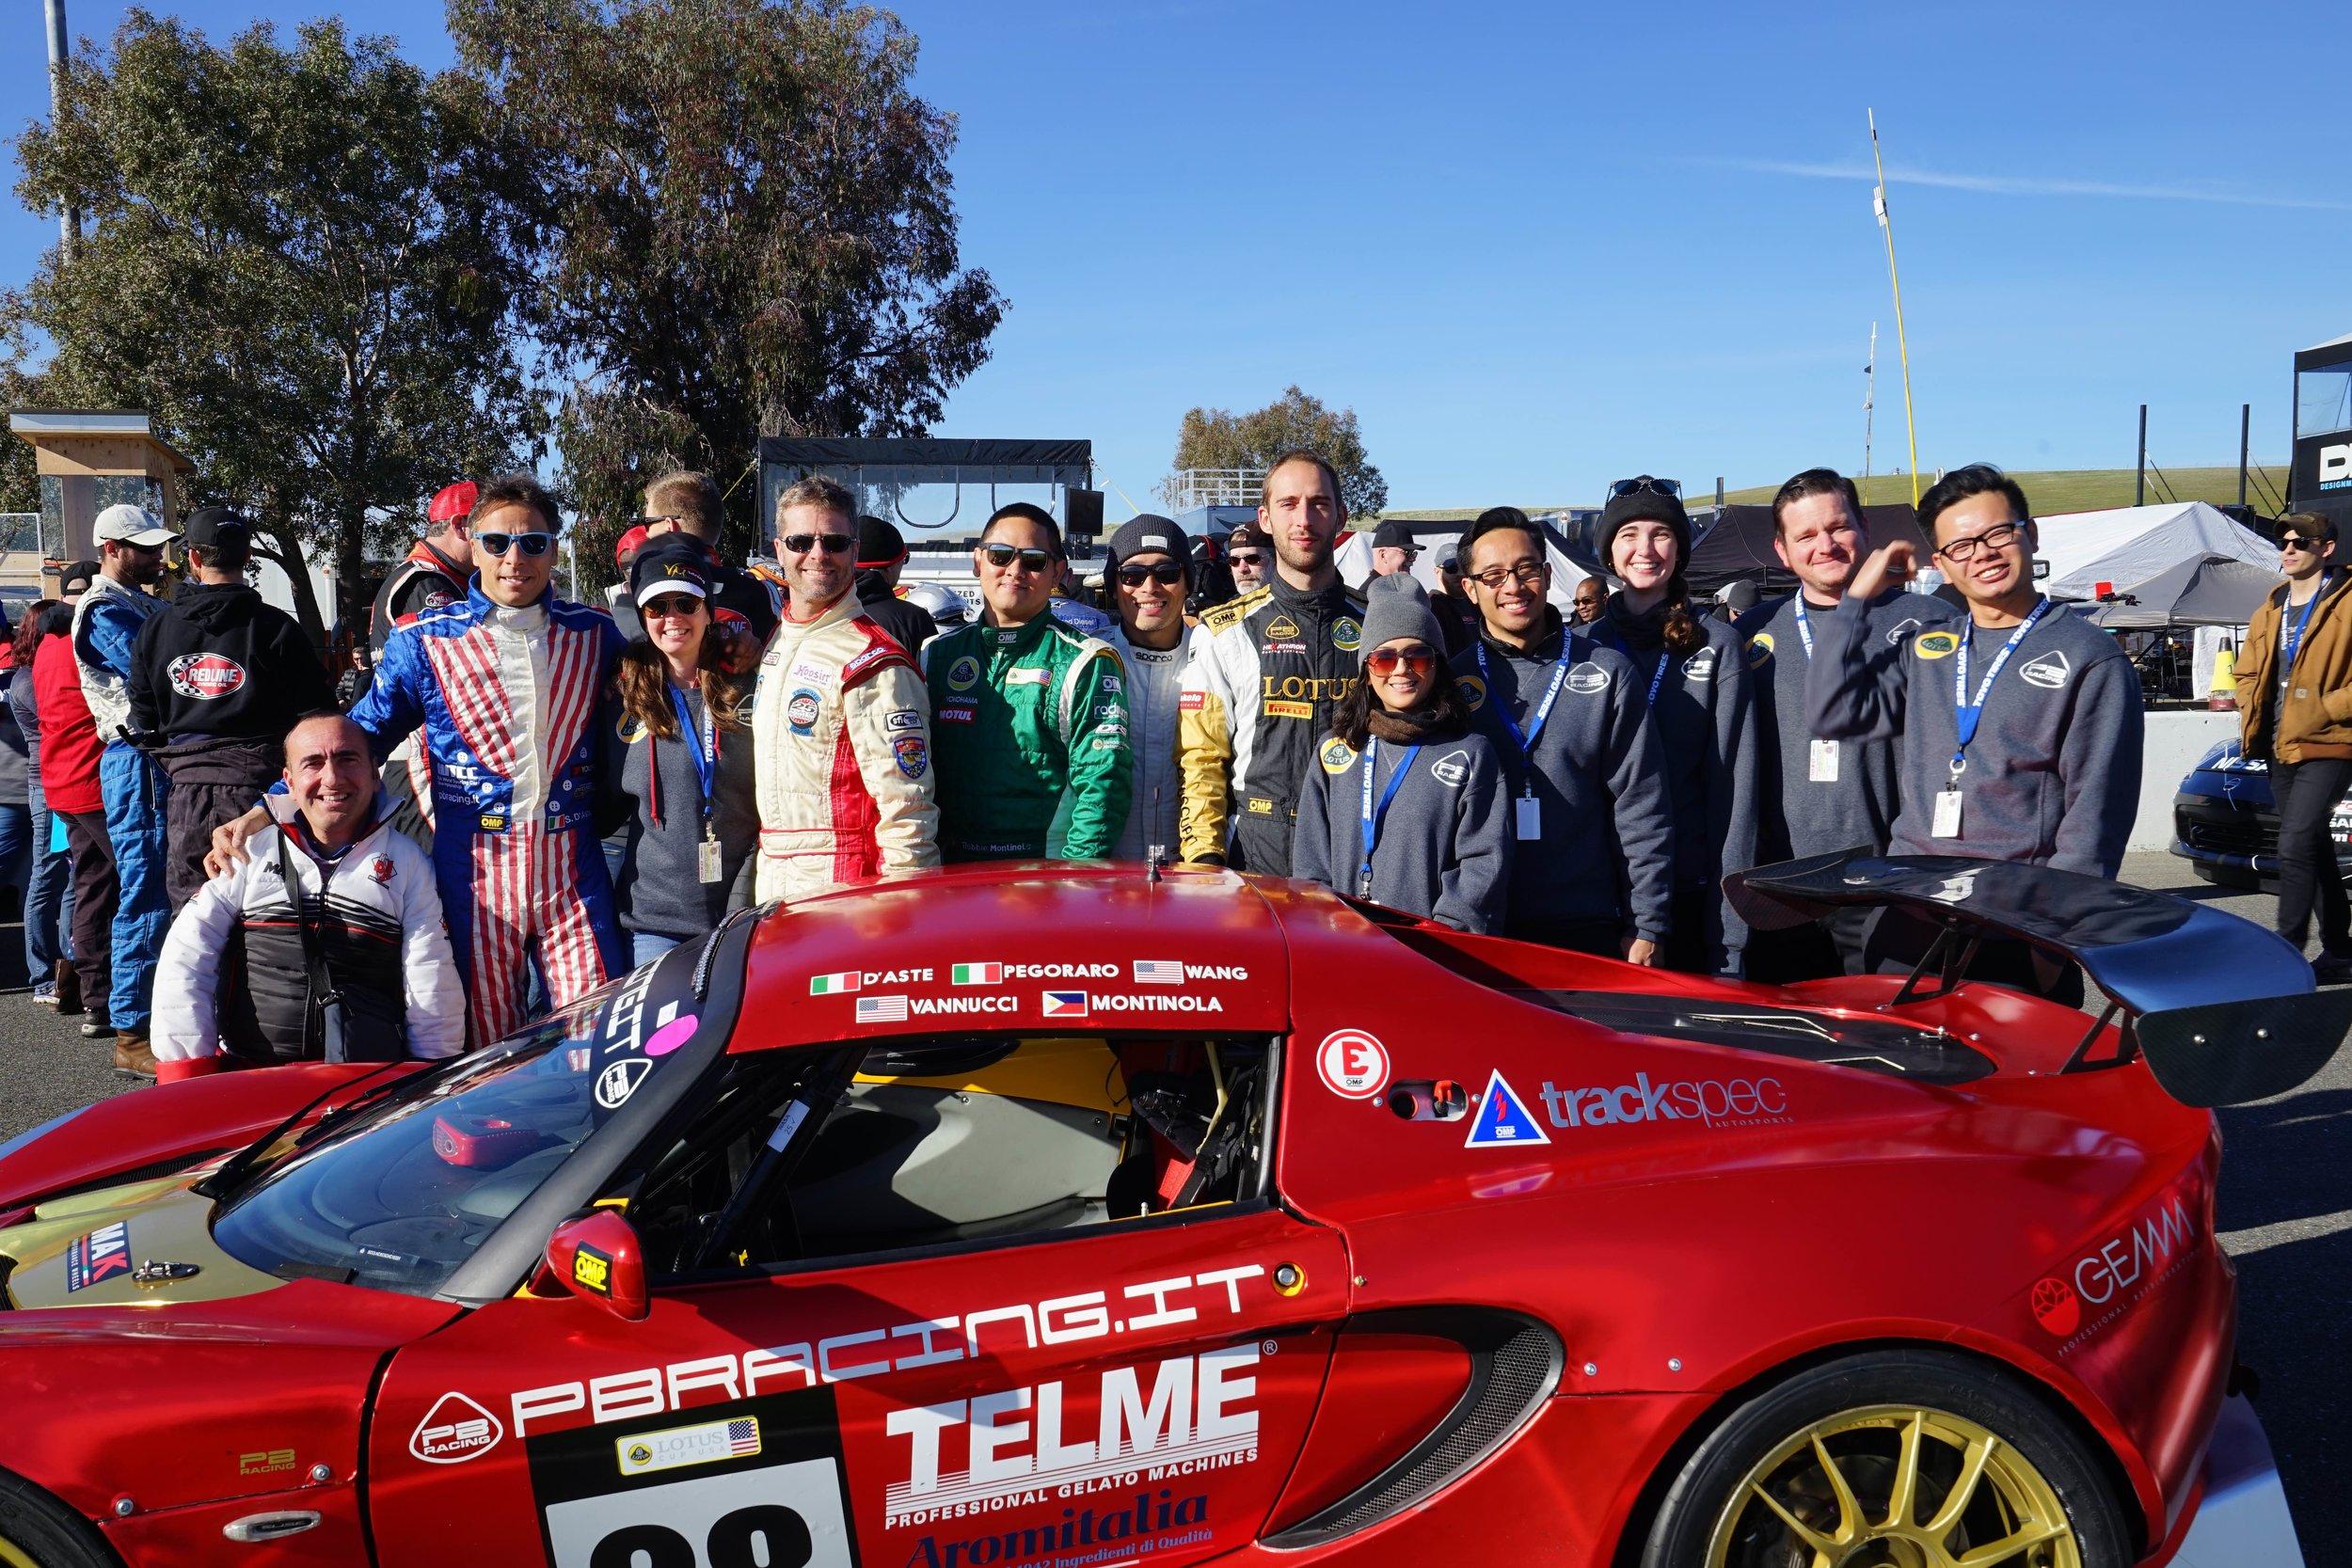 Group photo, but missing Carlo, Luca,and Andrea! PB Racing + Lotus Cup USA + Trackspec Autosports. Great team. PC: Stepanova Nekeel.